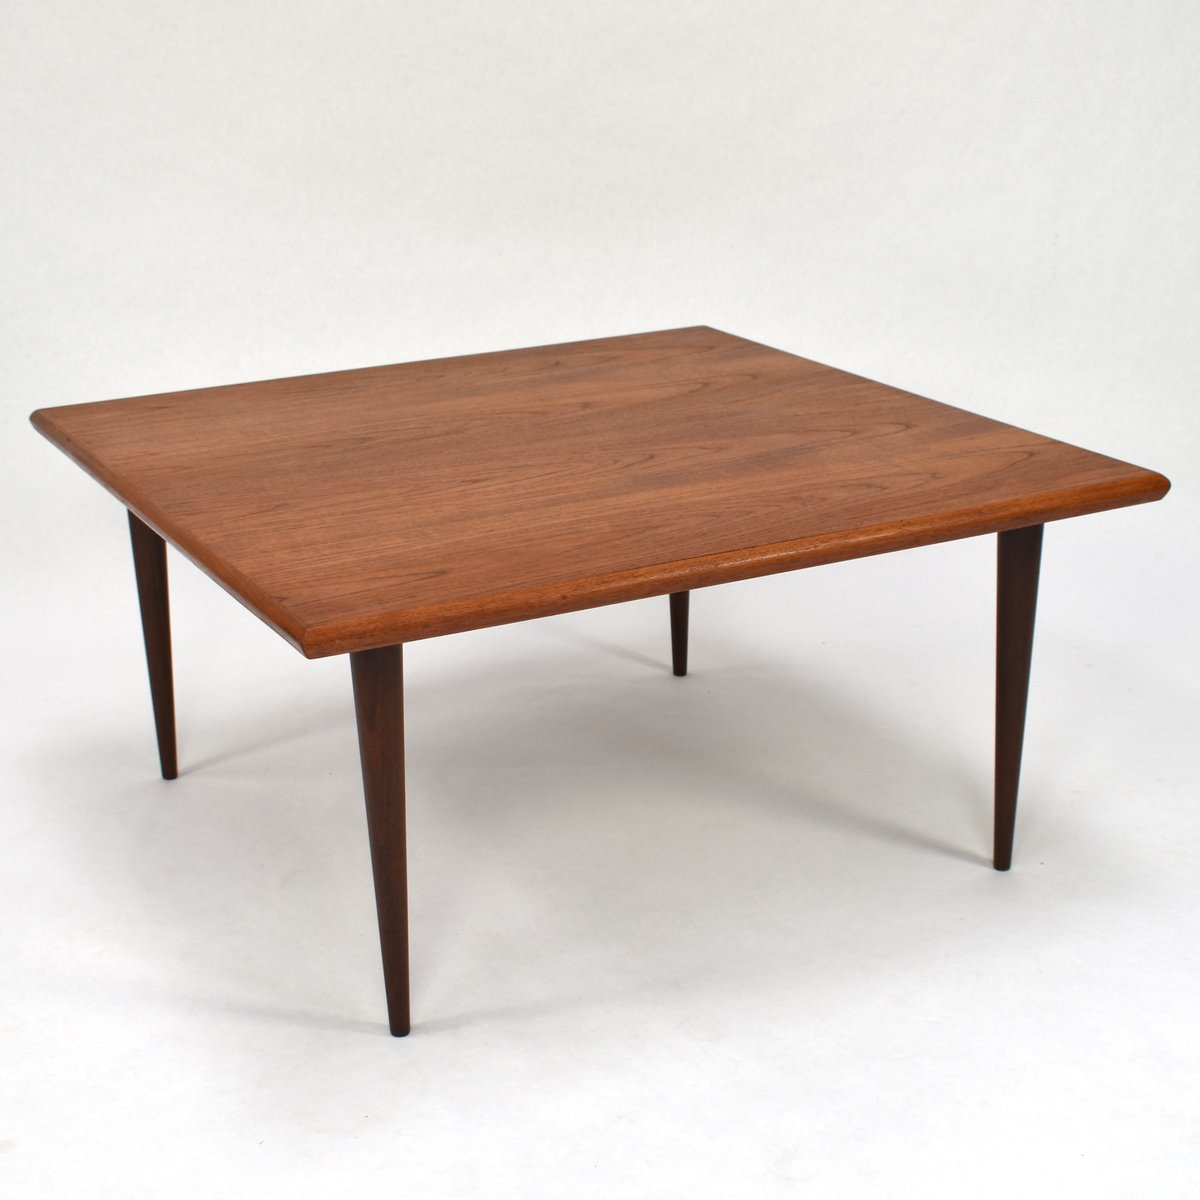 Danish Teak Coffee Table, 1950s For Sale At Pamono